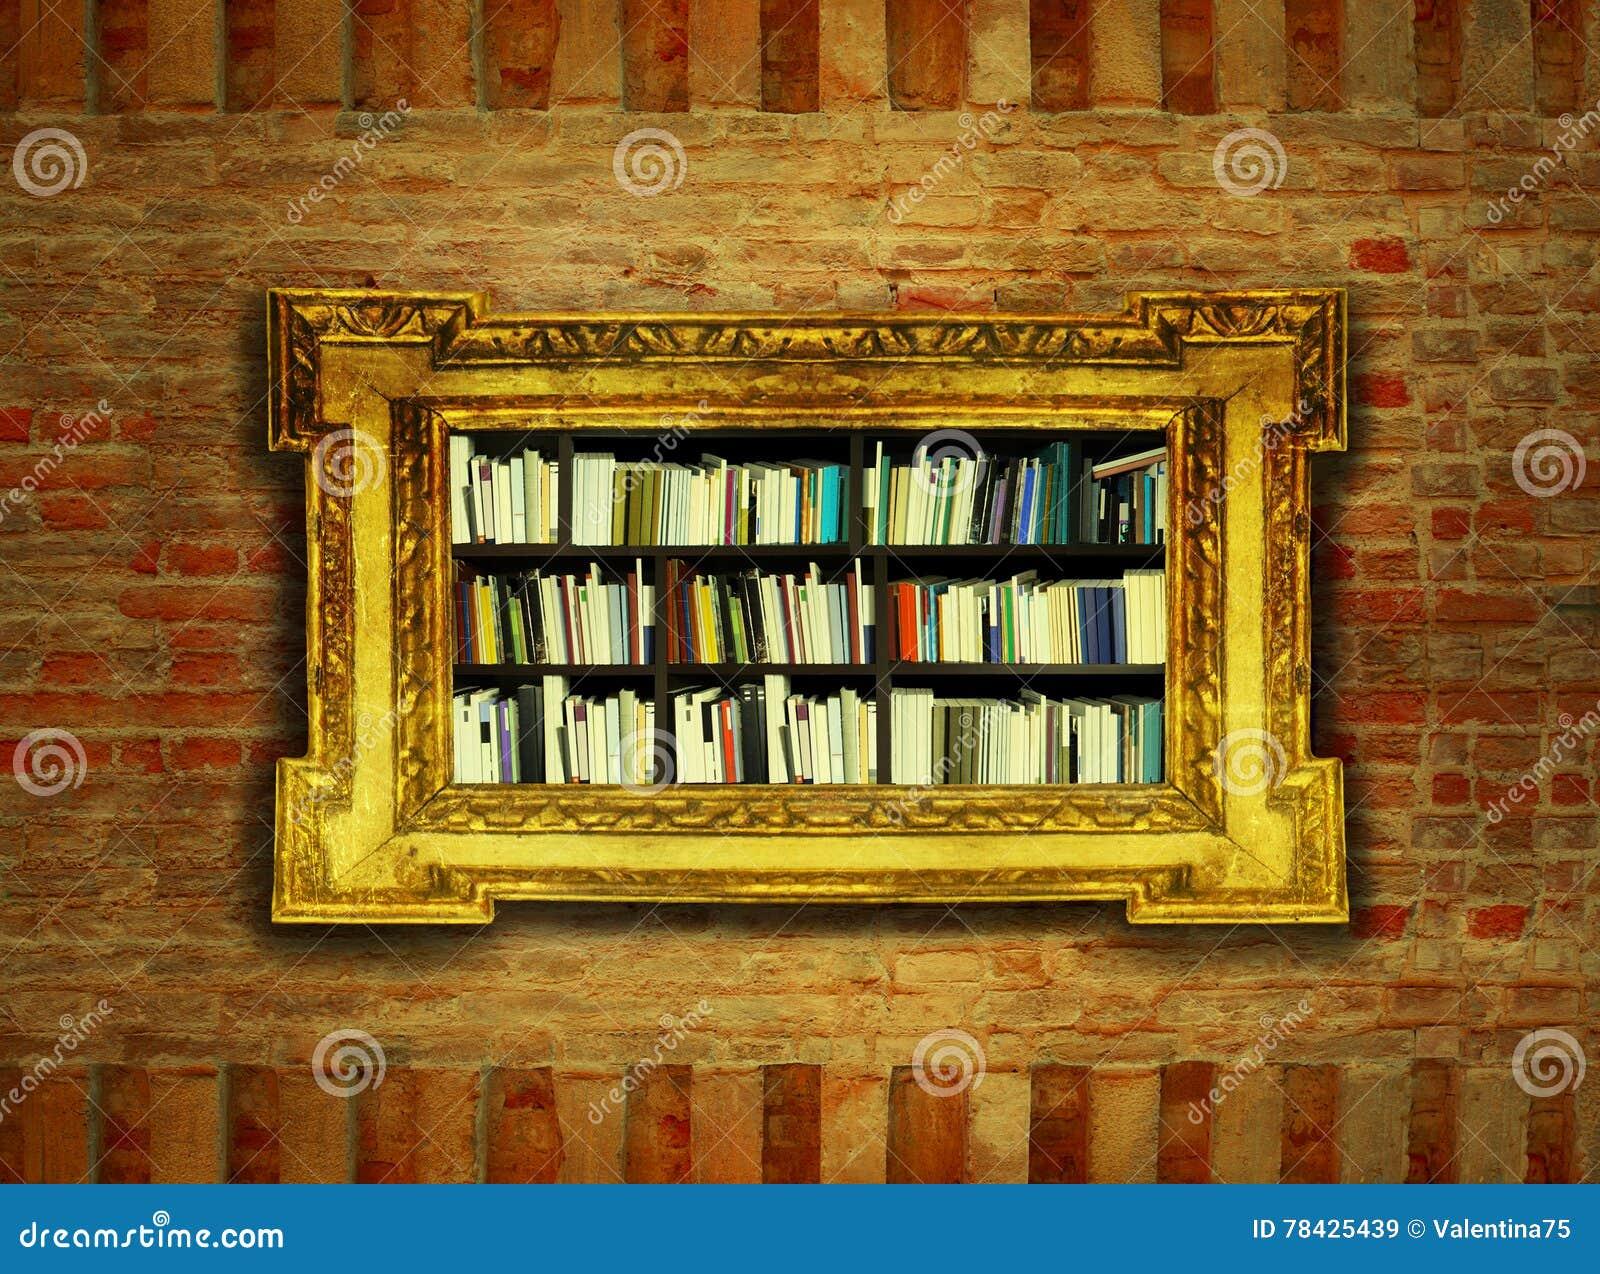 Boroque Bookcase stock image. Image of background, golden - 78425439